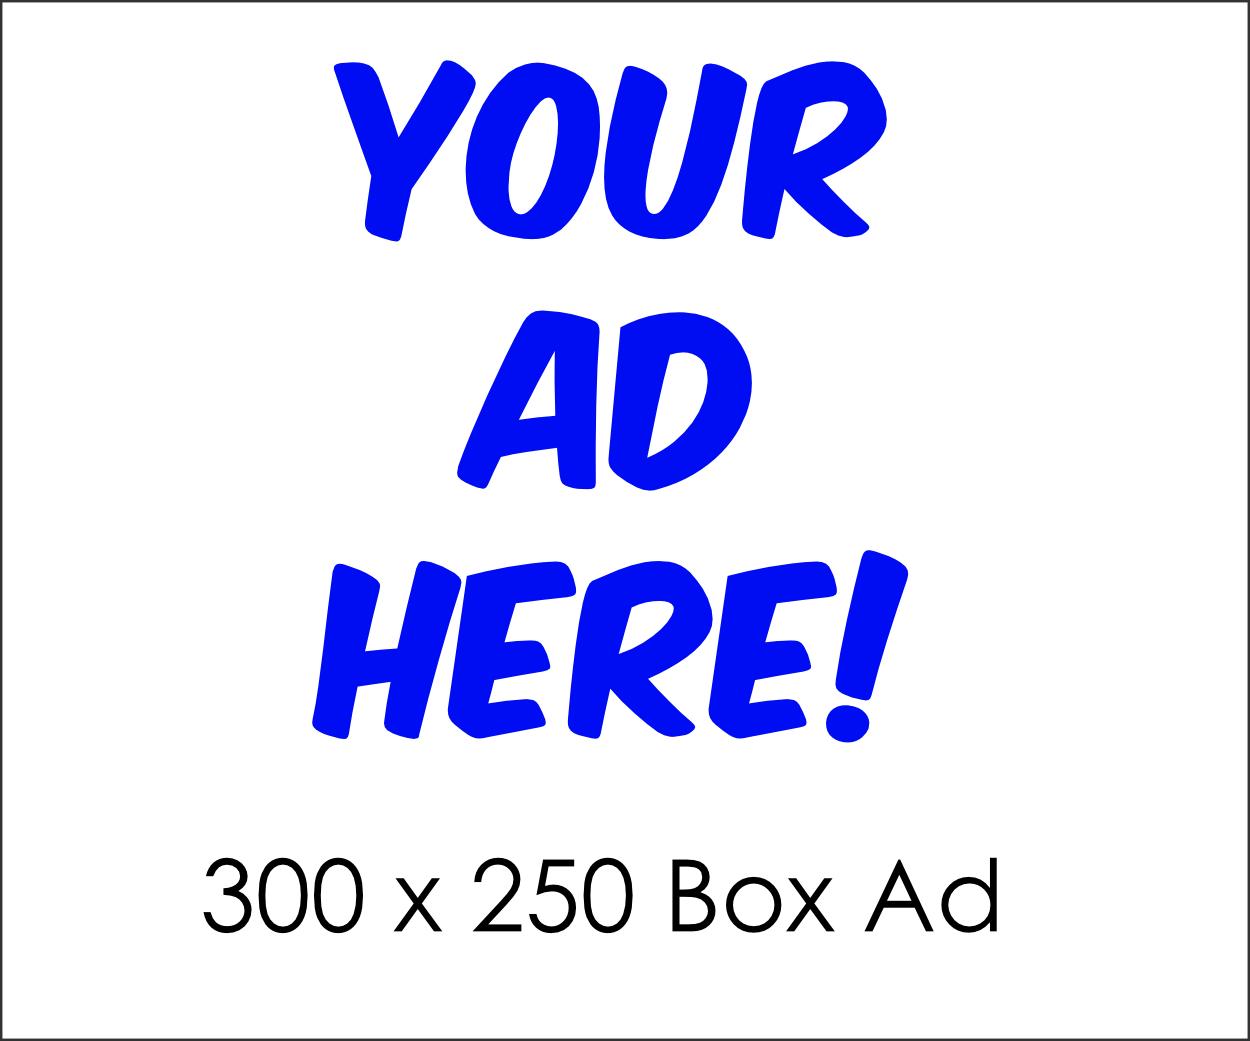 Box Ad - Advertising on Johns Creek Post